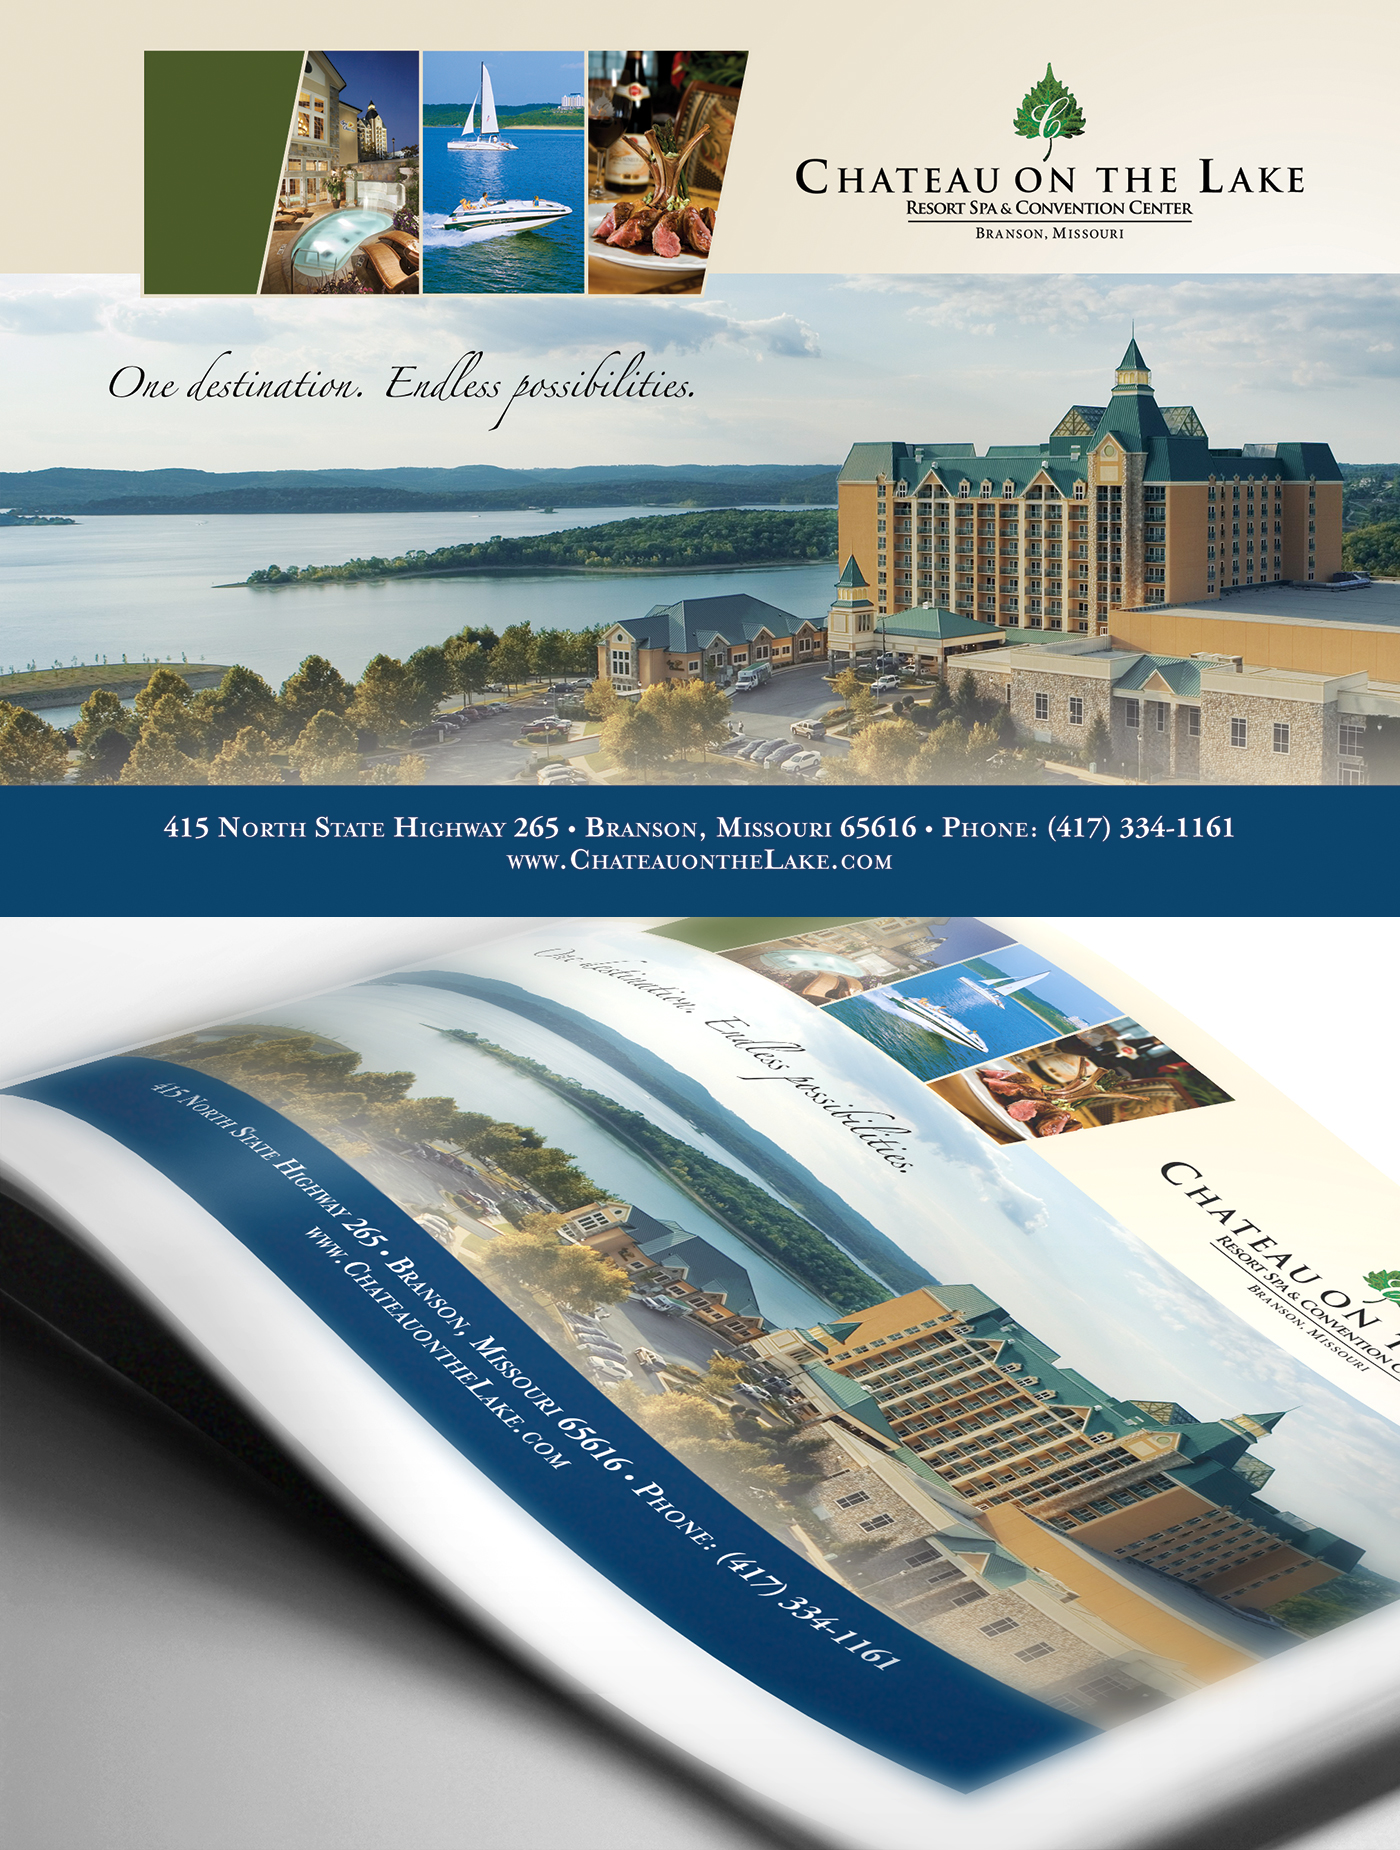 Chateau on the Lake magazine ad